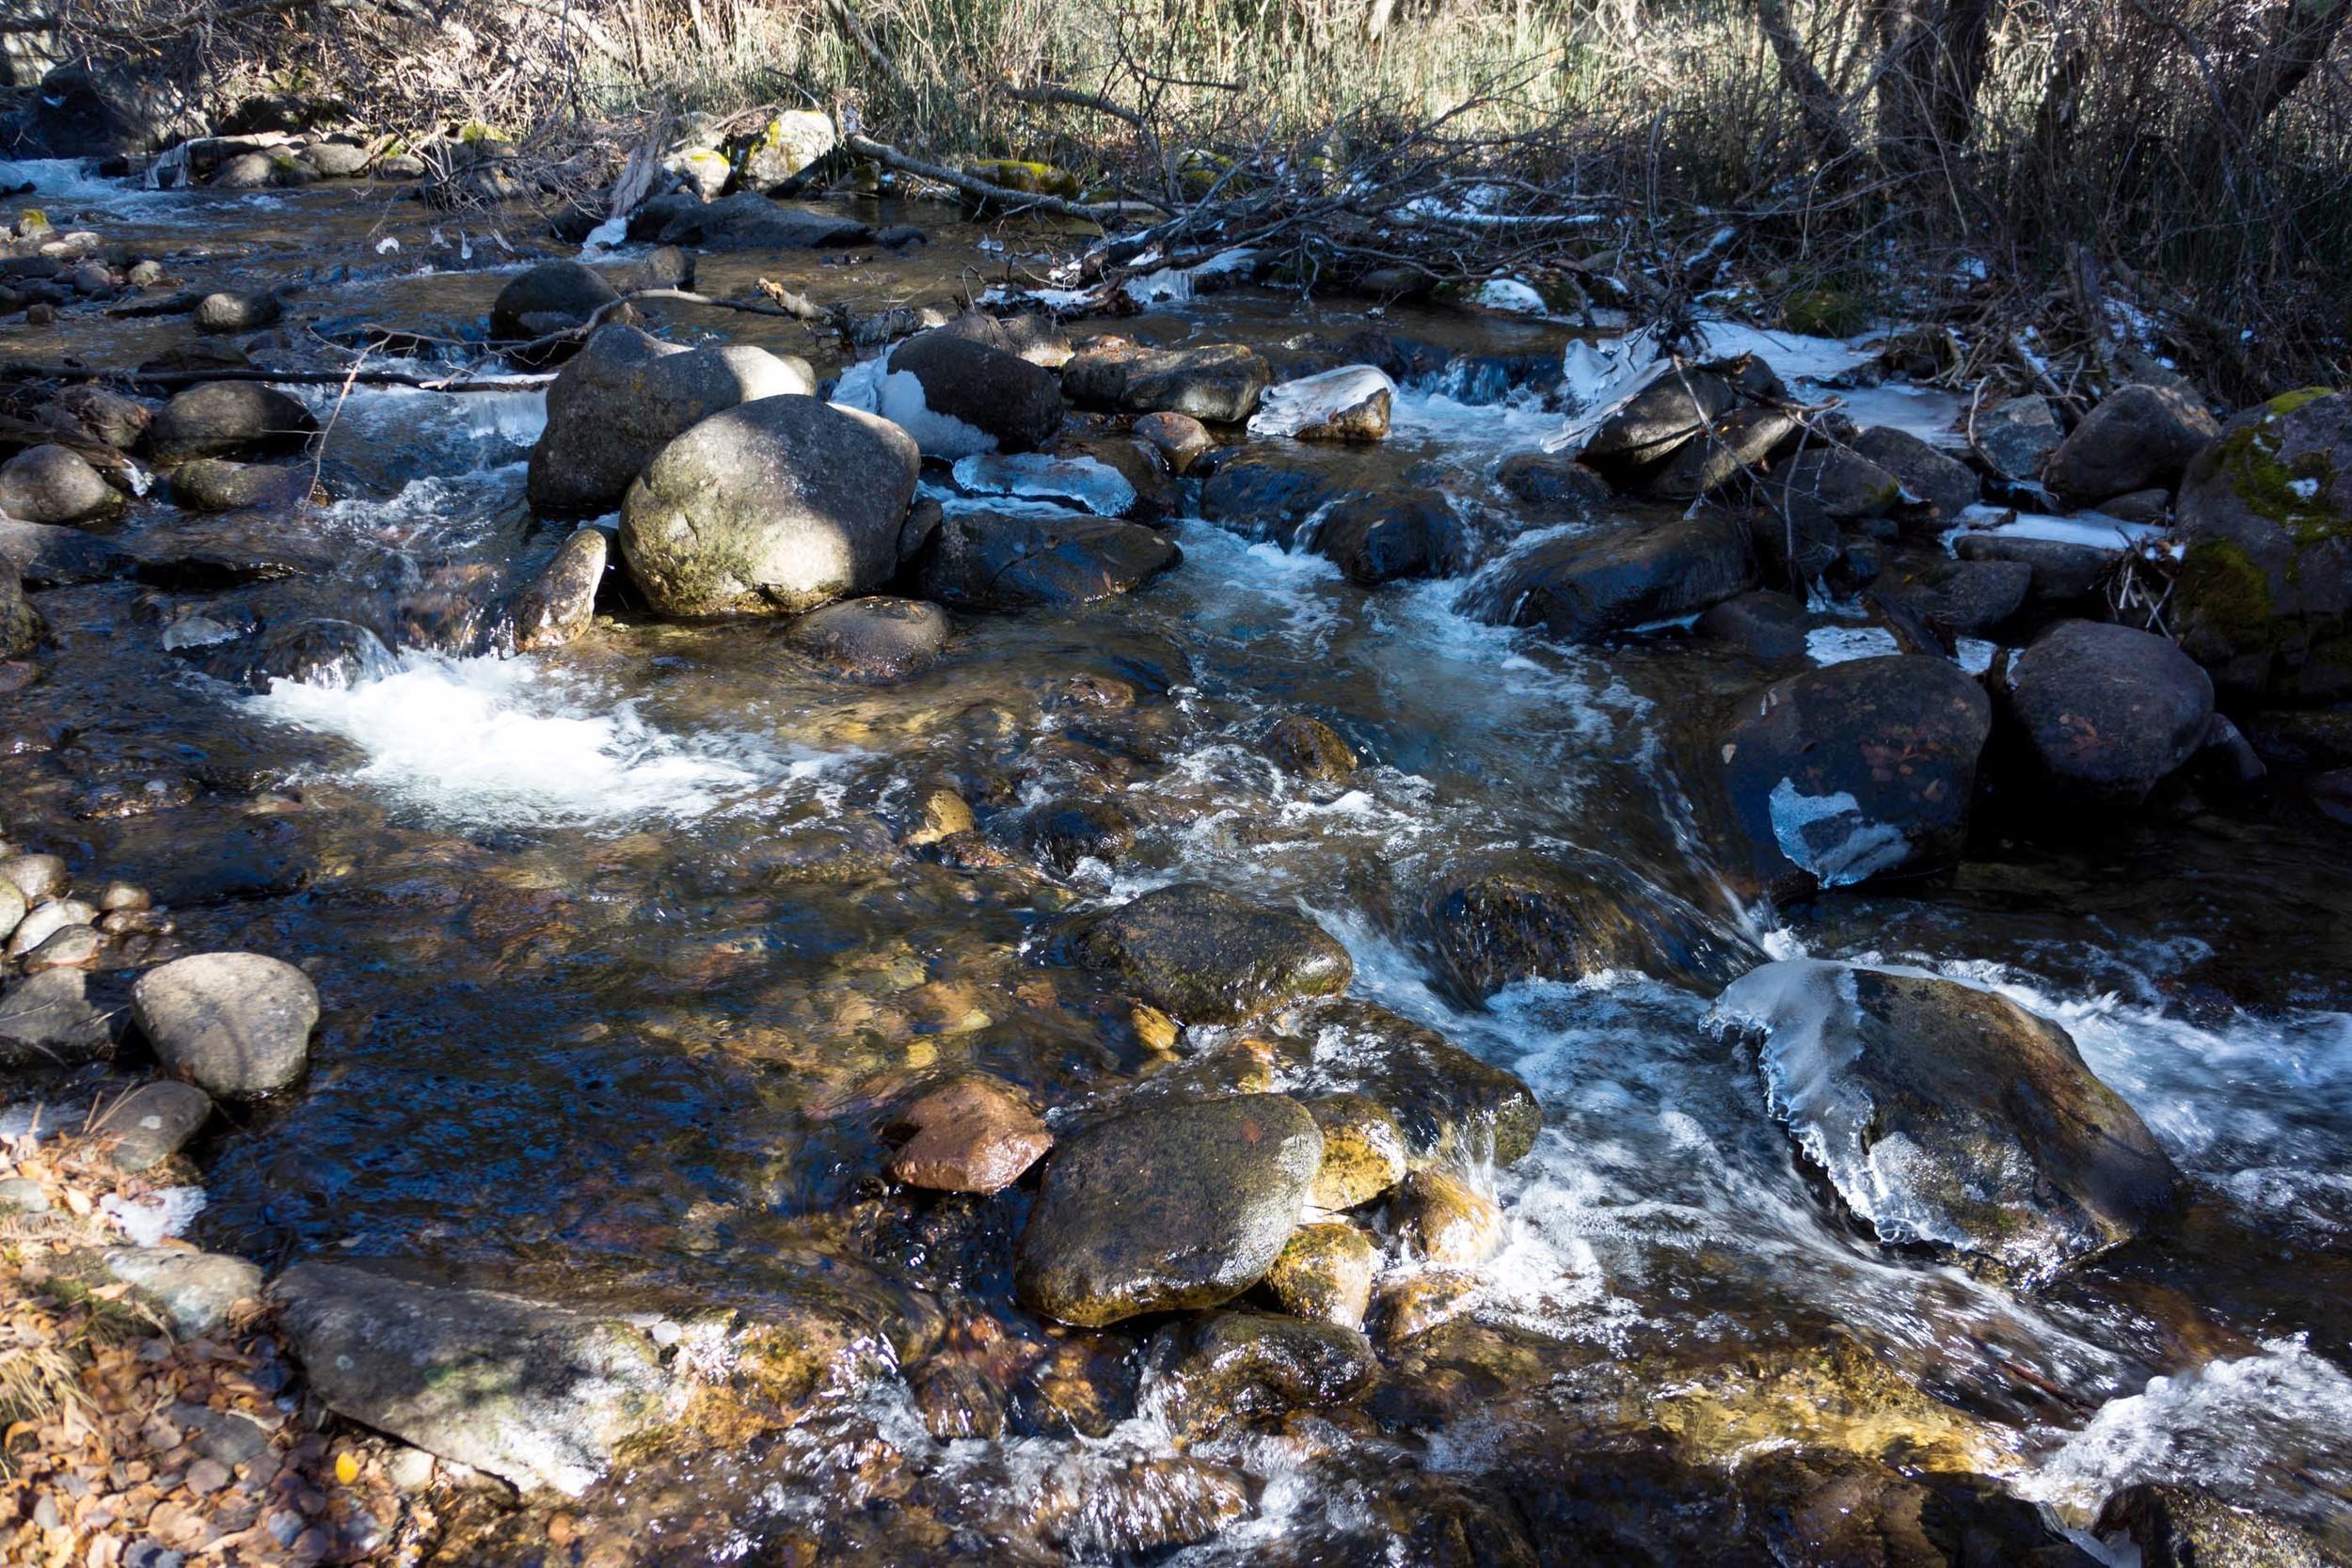 site-11-11-13 LR RAW n. crestone creek scene 2.jpg